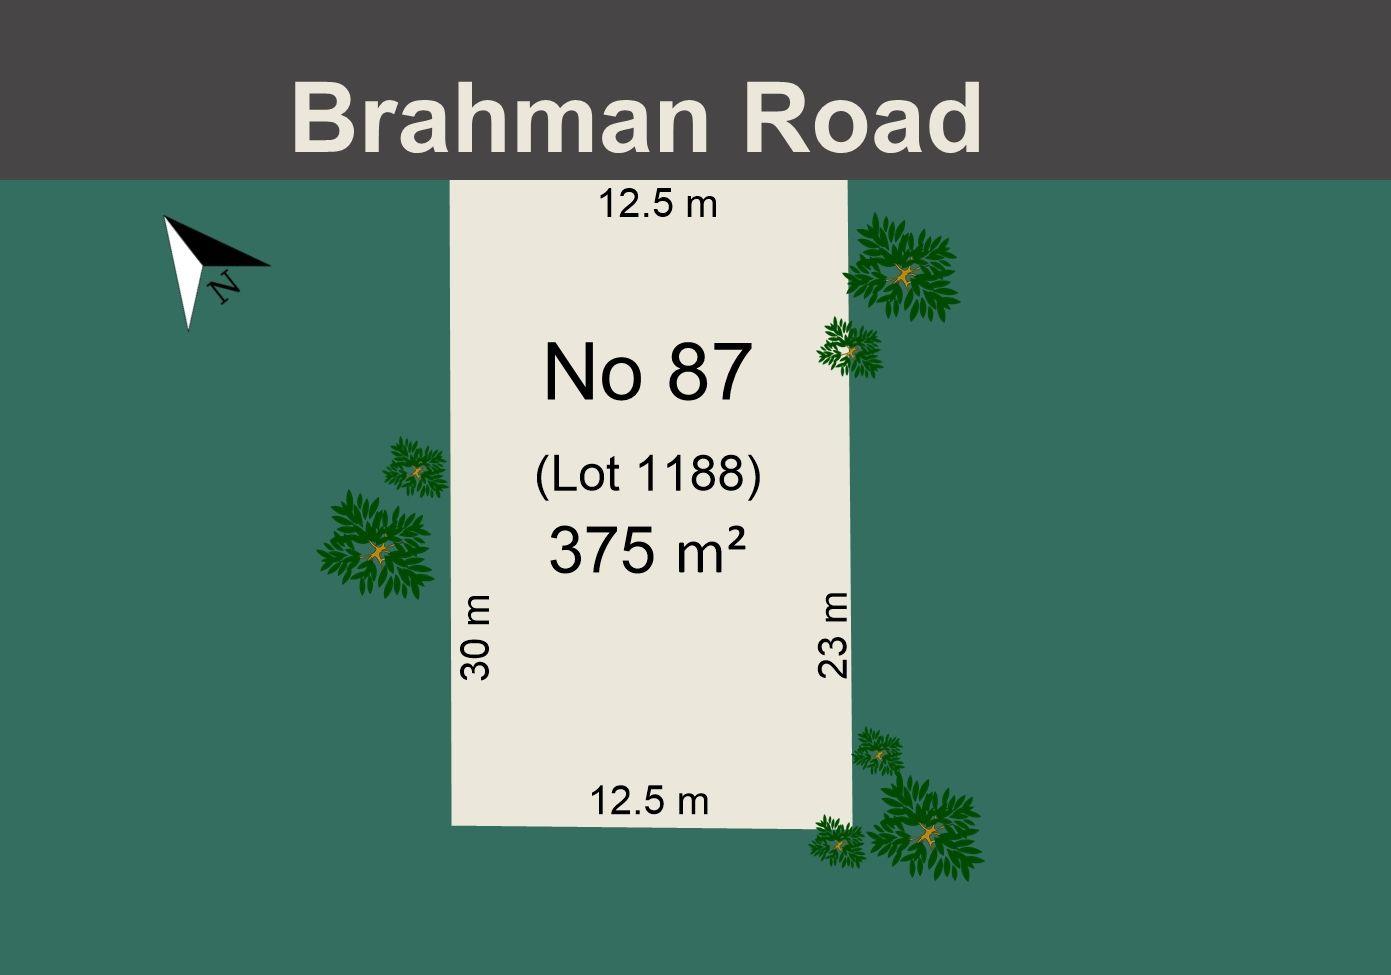 87 (Lot 1188) Brahman Road, Box Hill NSW 2765, Image 0